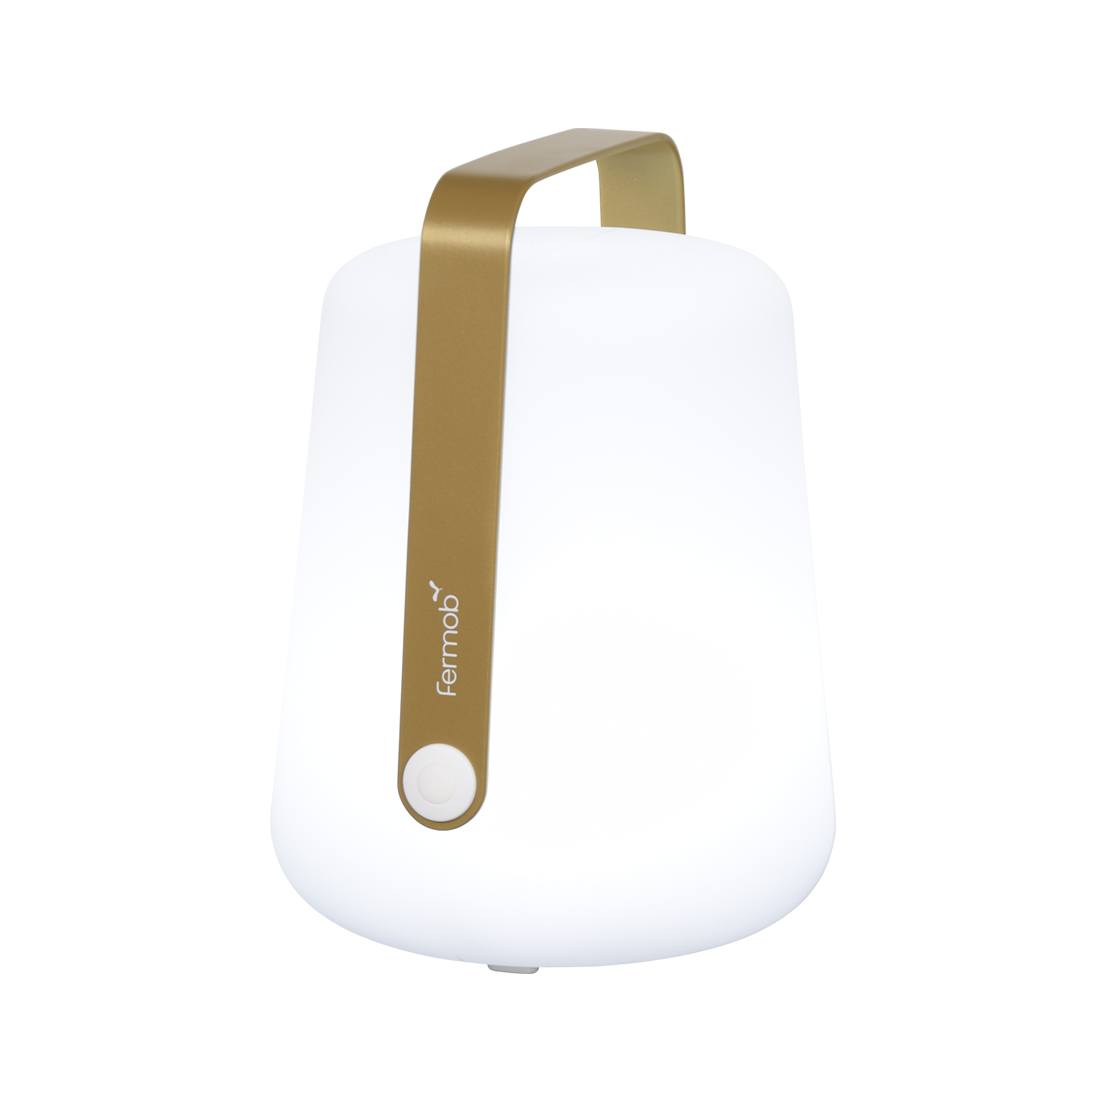 Lampe Balad H38.cm Gold Fever